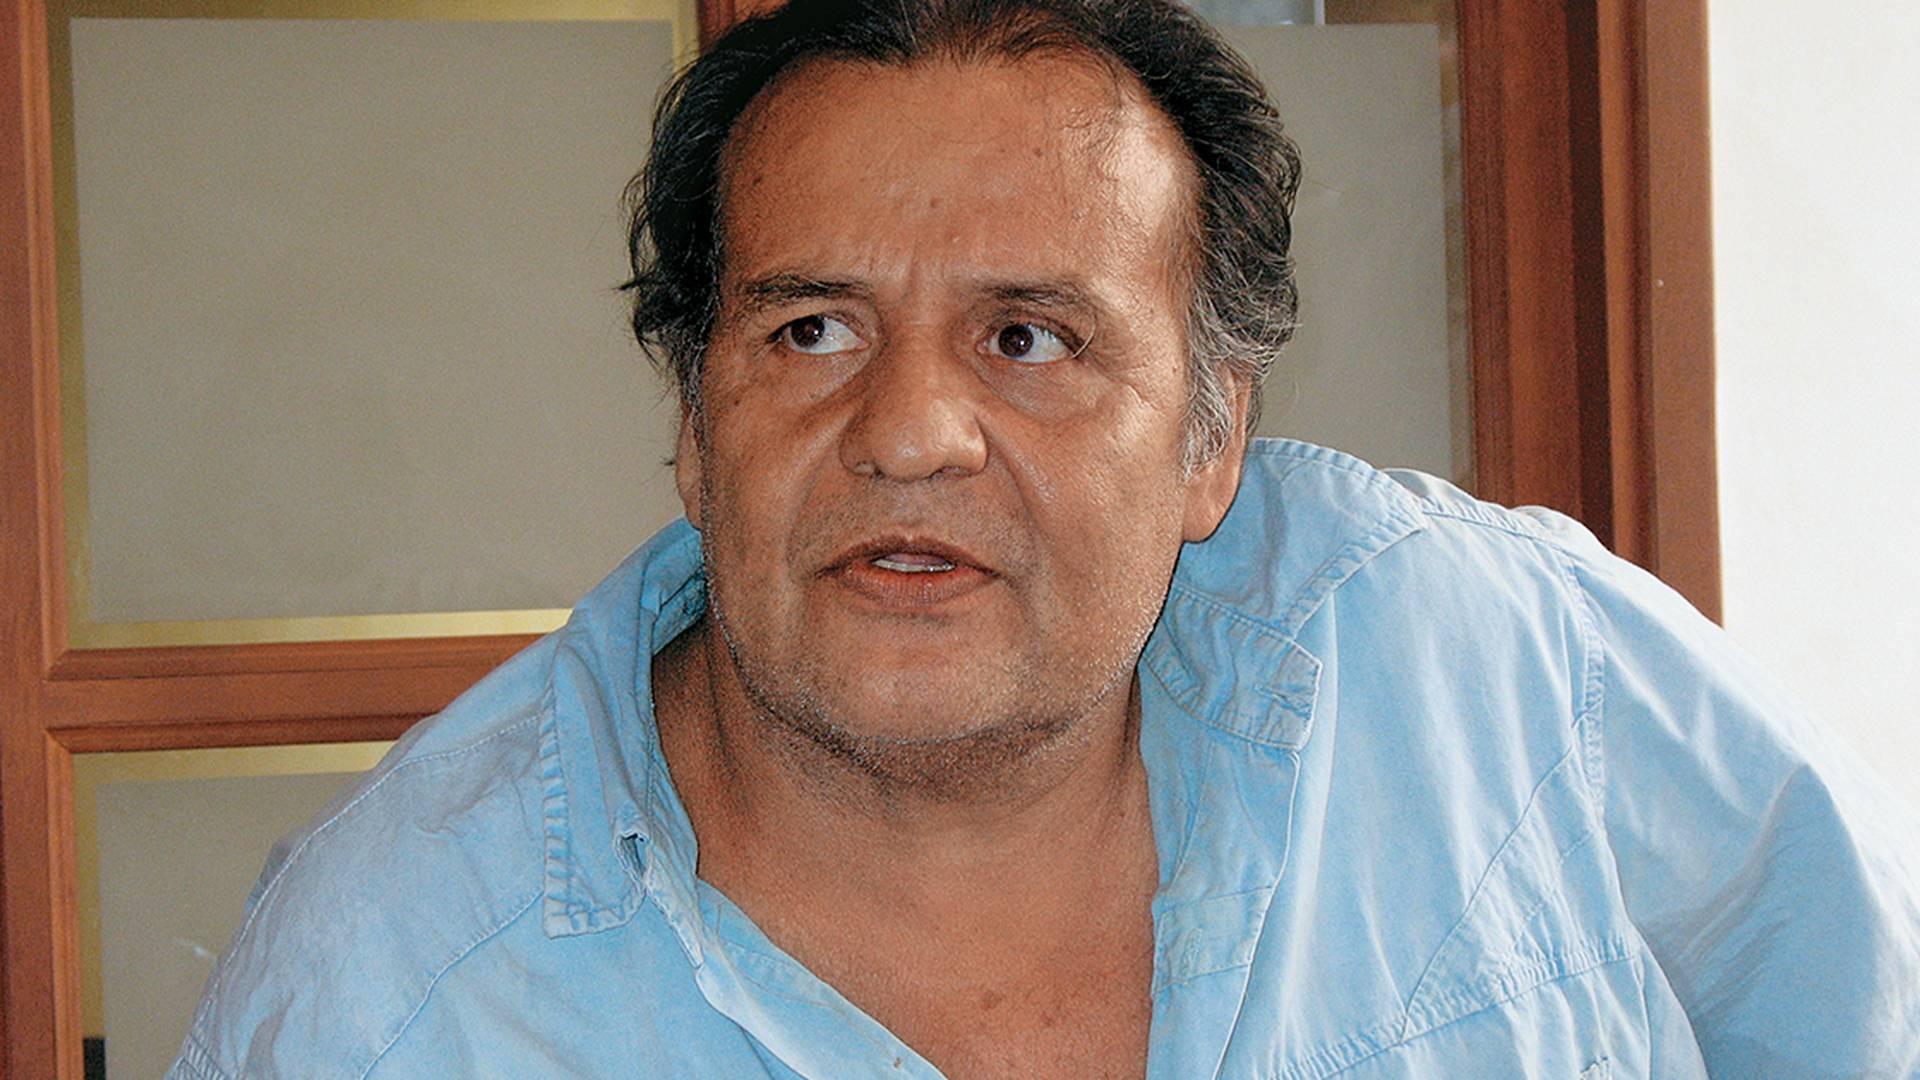 Martín Sombra